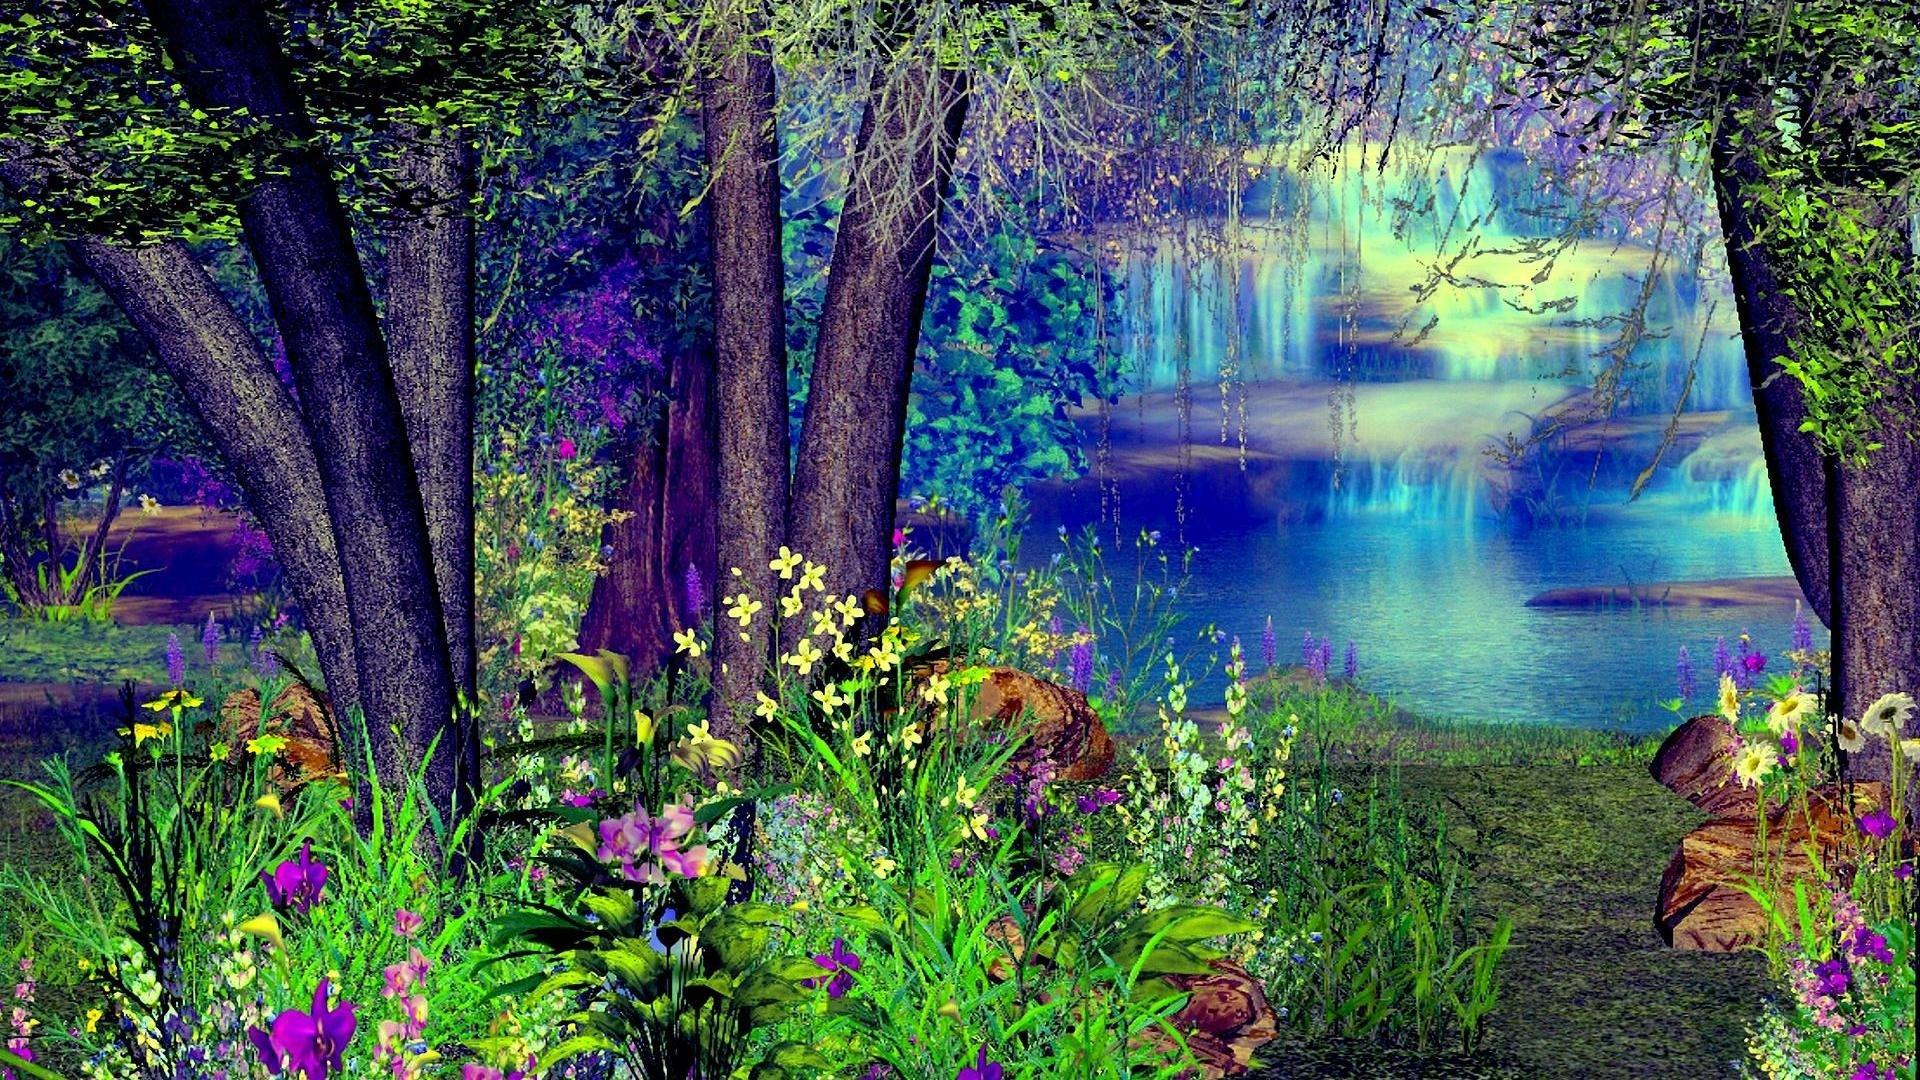 Artistic - Lake  Artistic Waterfall Tree Colors Colorful Mystic Fantasy Wallpaper